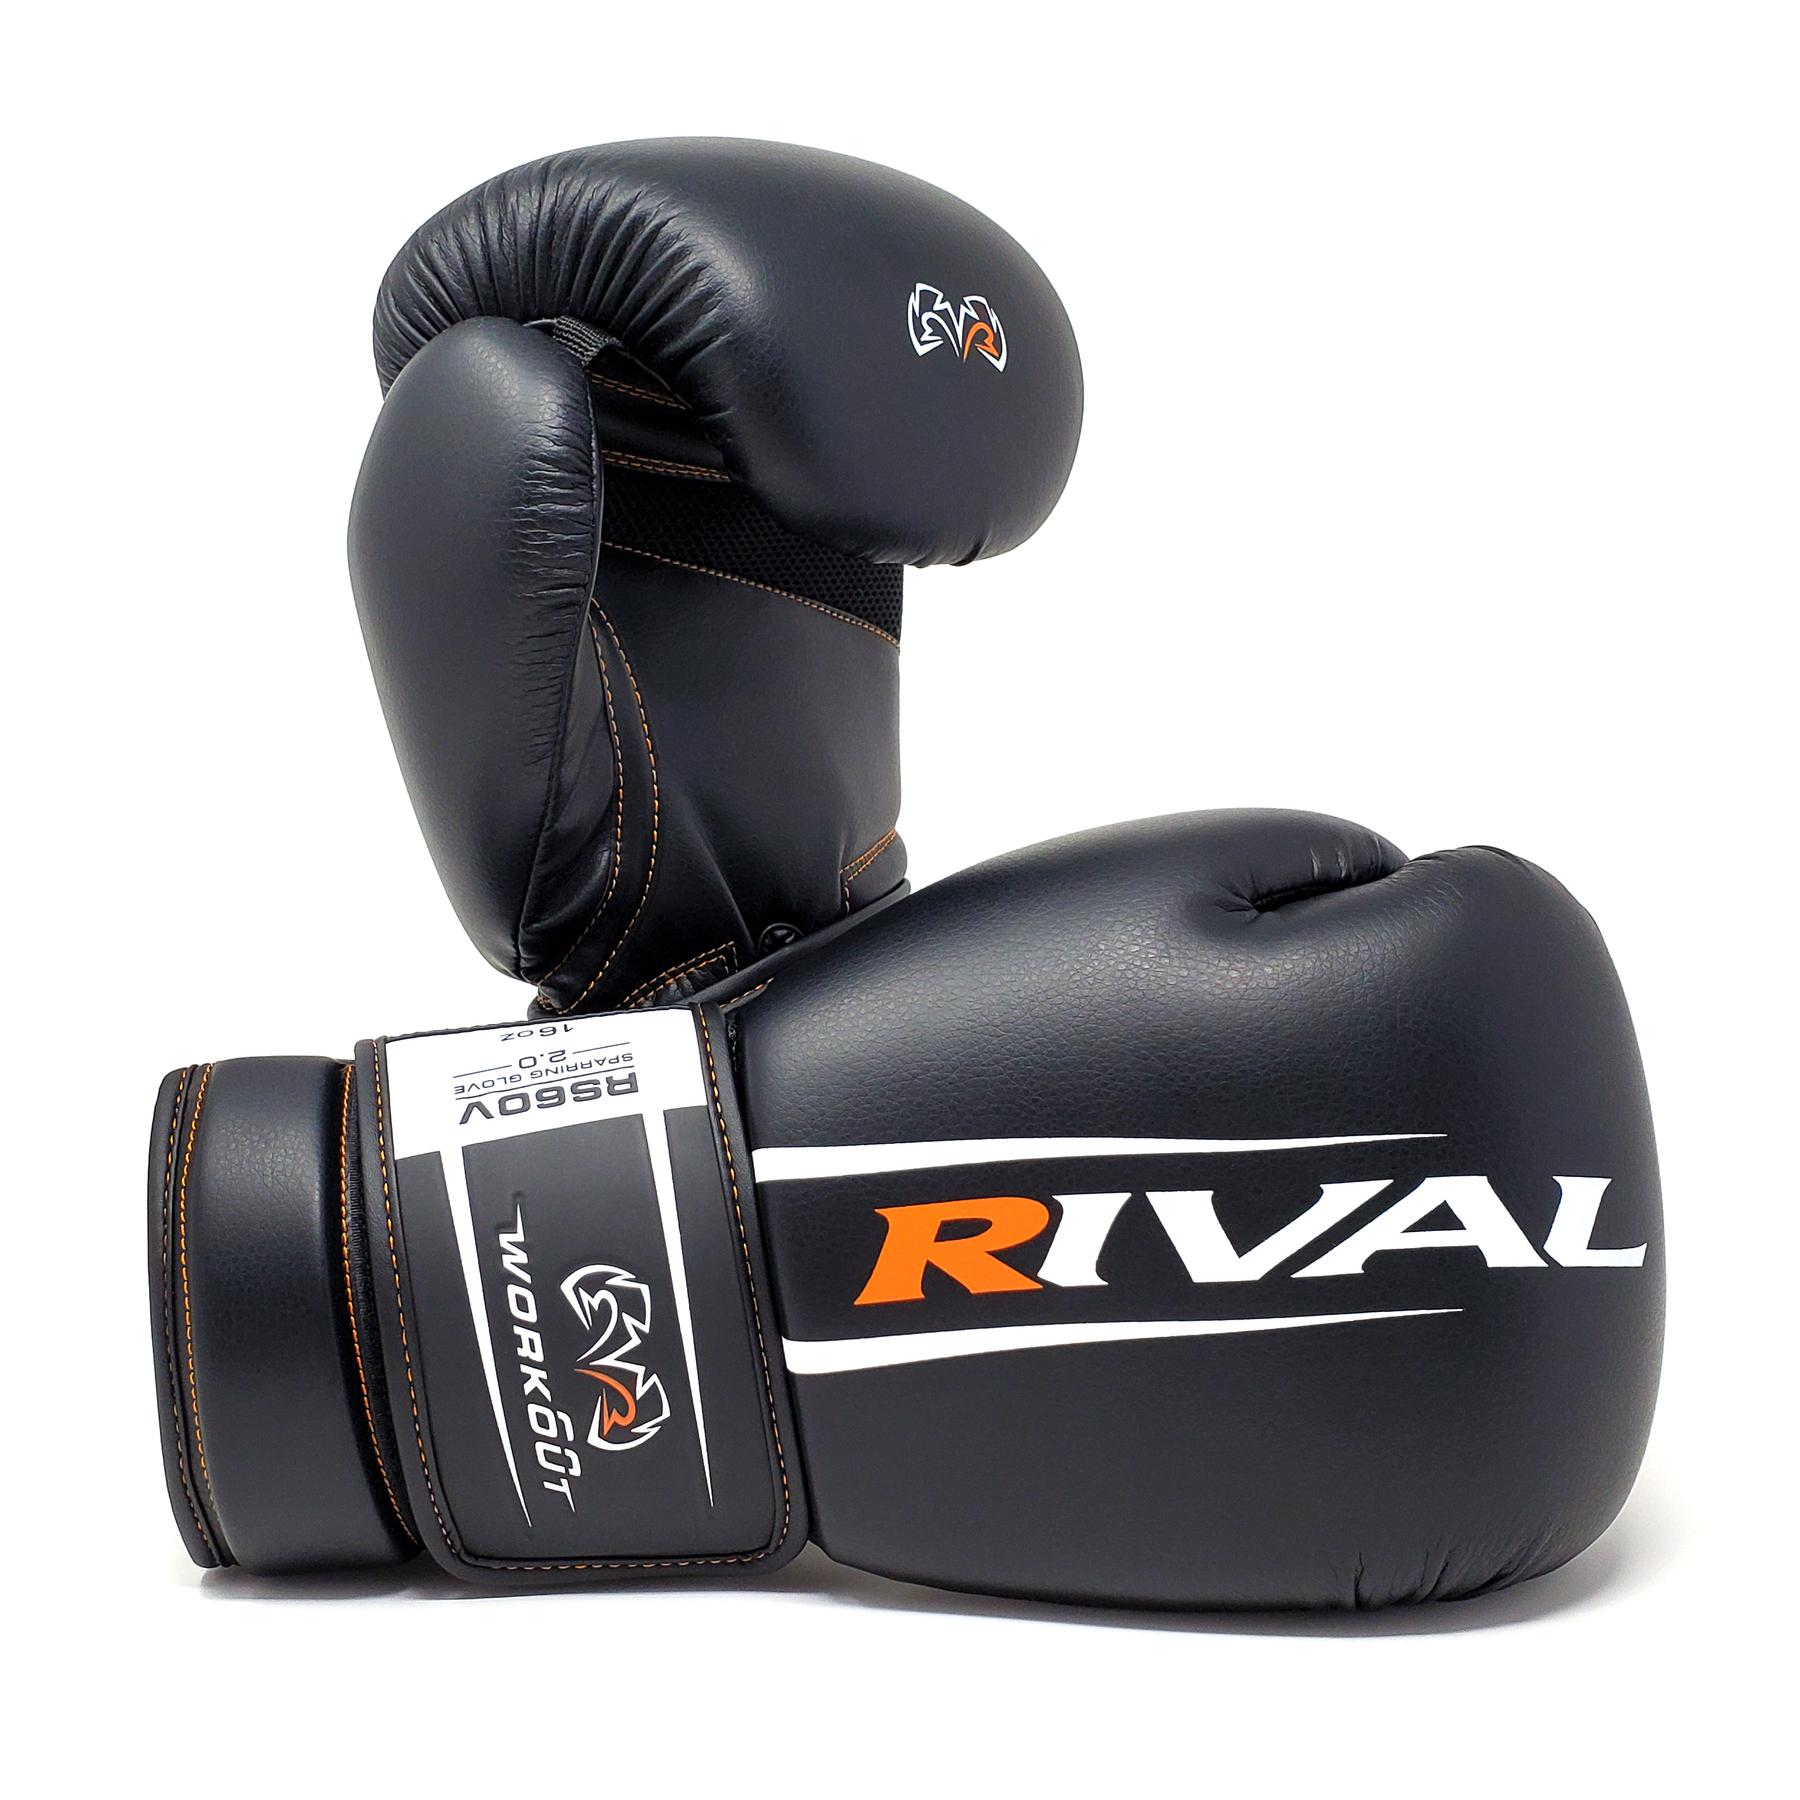 Боксерские перчатки RIVAL RS60V Workout Sparring Gloves 2.0 12 унций